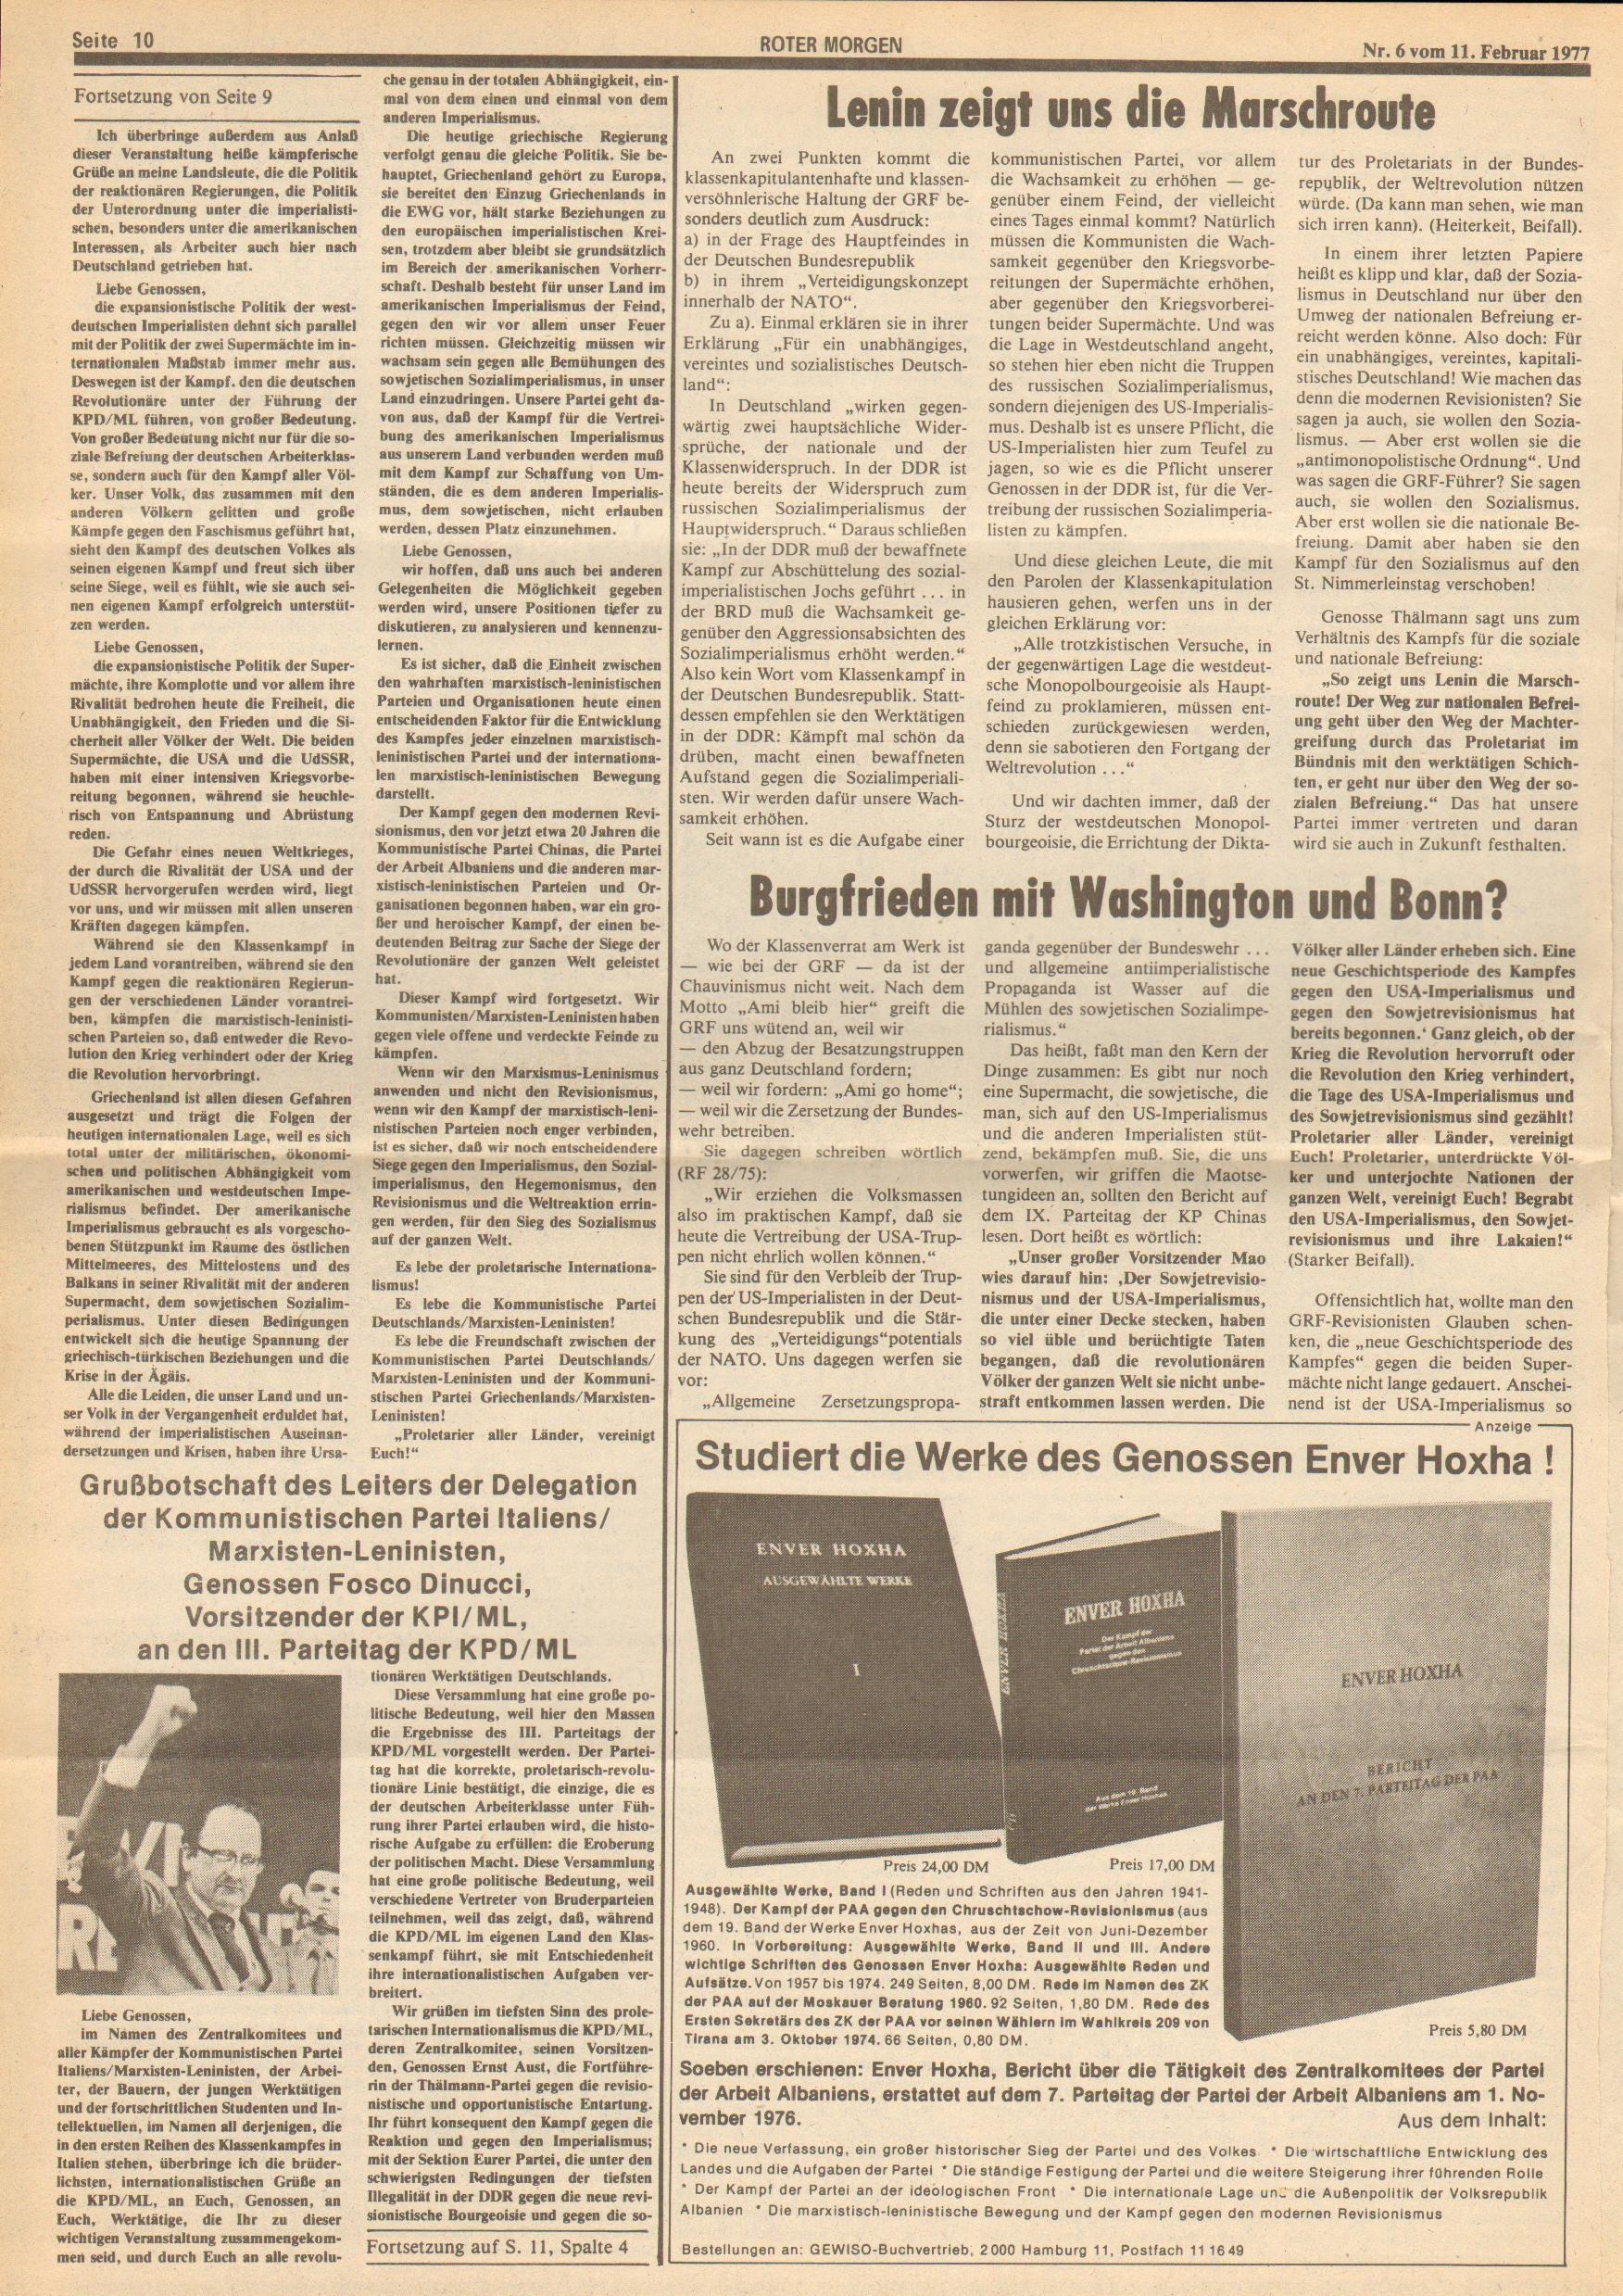 Roter Morgen, 11. Jg., 11. Februar 1977, Nr. 6, Seite 10